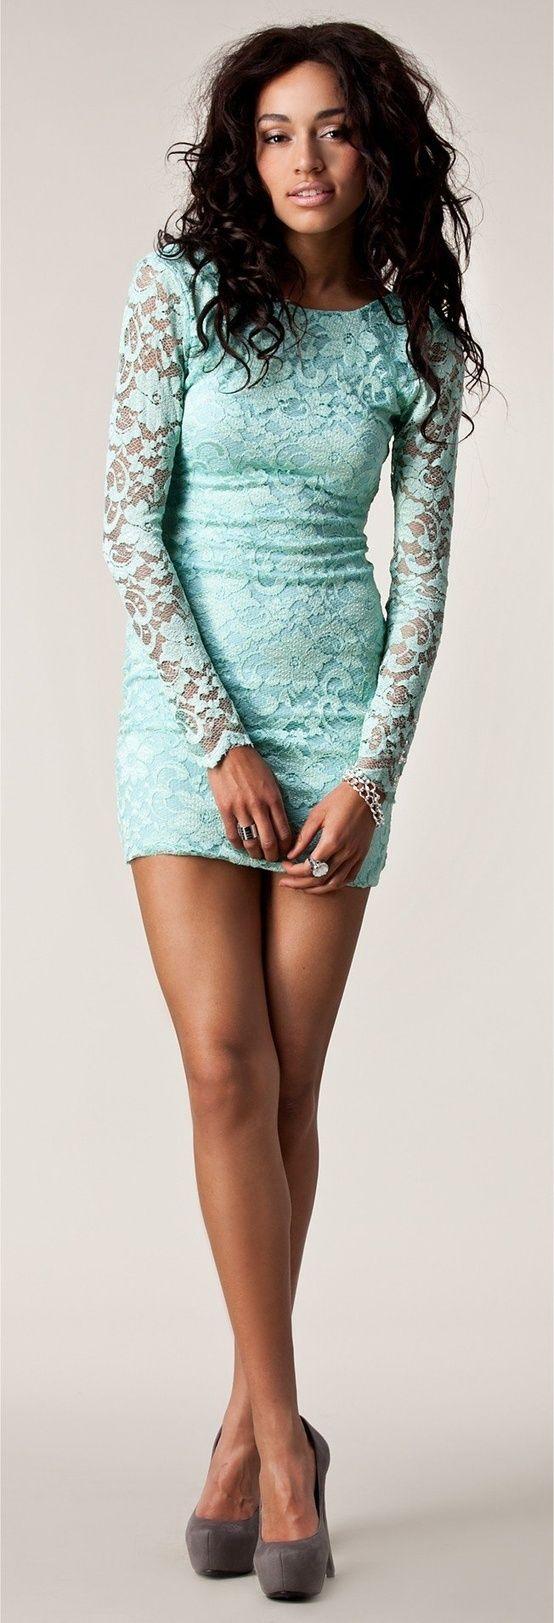 Mint lace long sleeve dress.